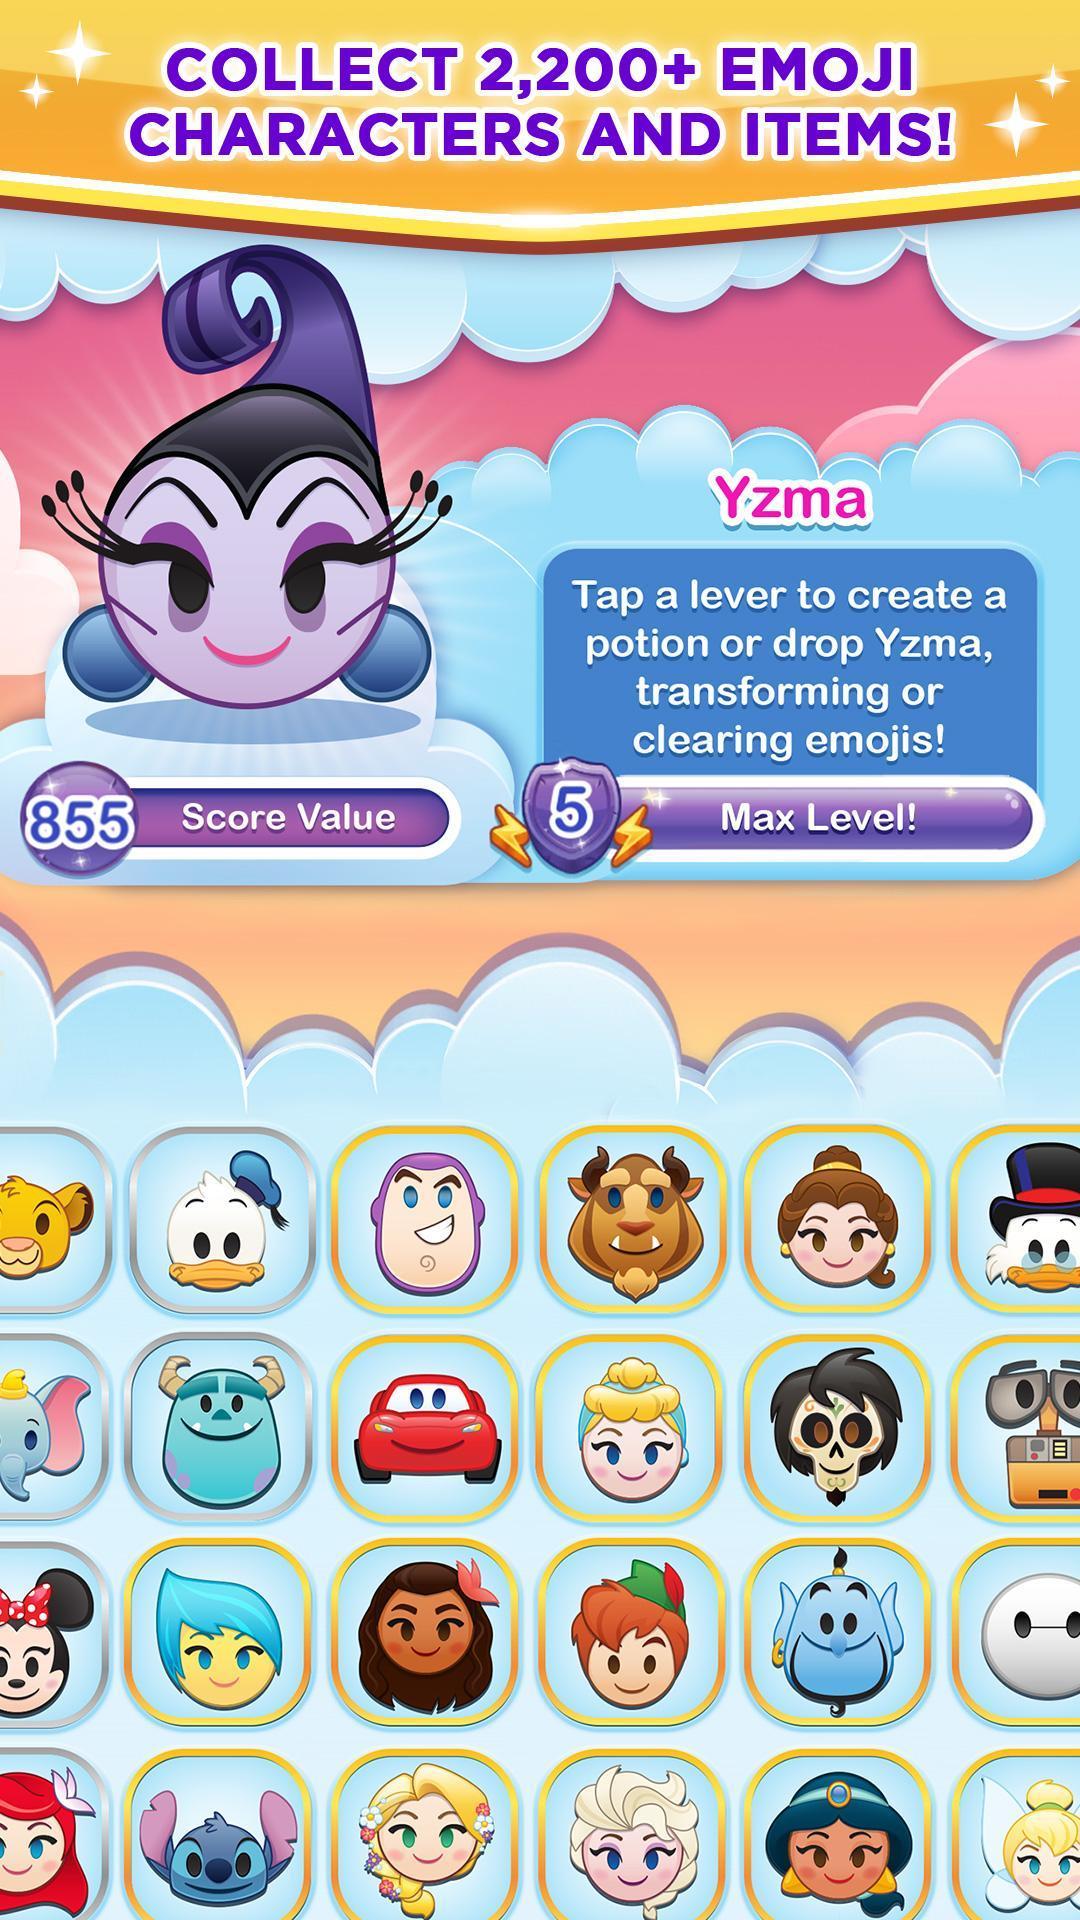 Disney Emoji Blitz For Android  Apk Download with regard to Emoji Blitz Event Calendar